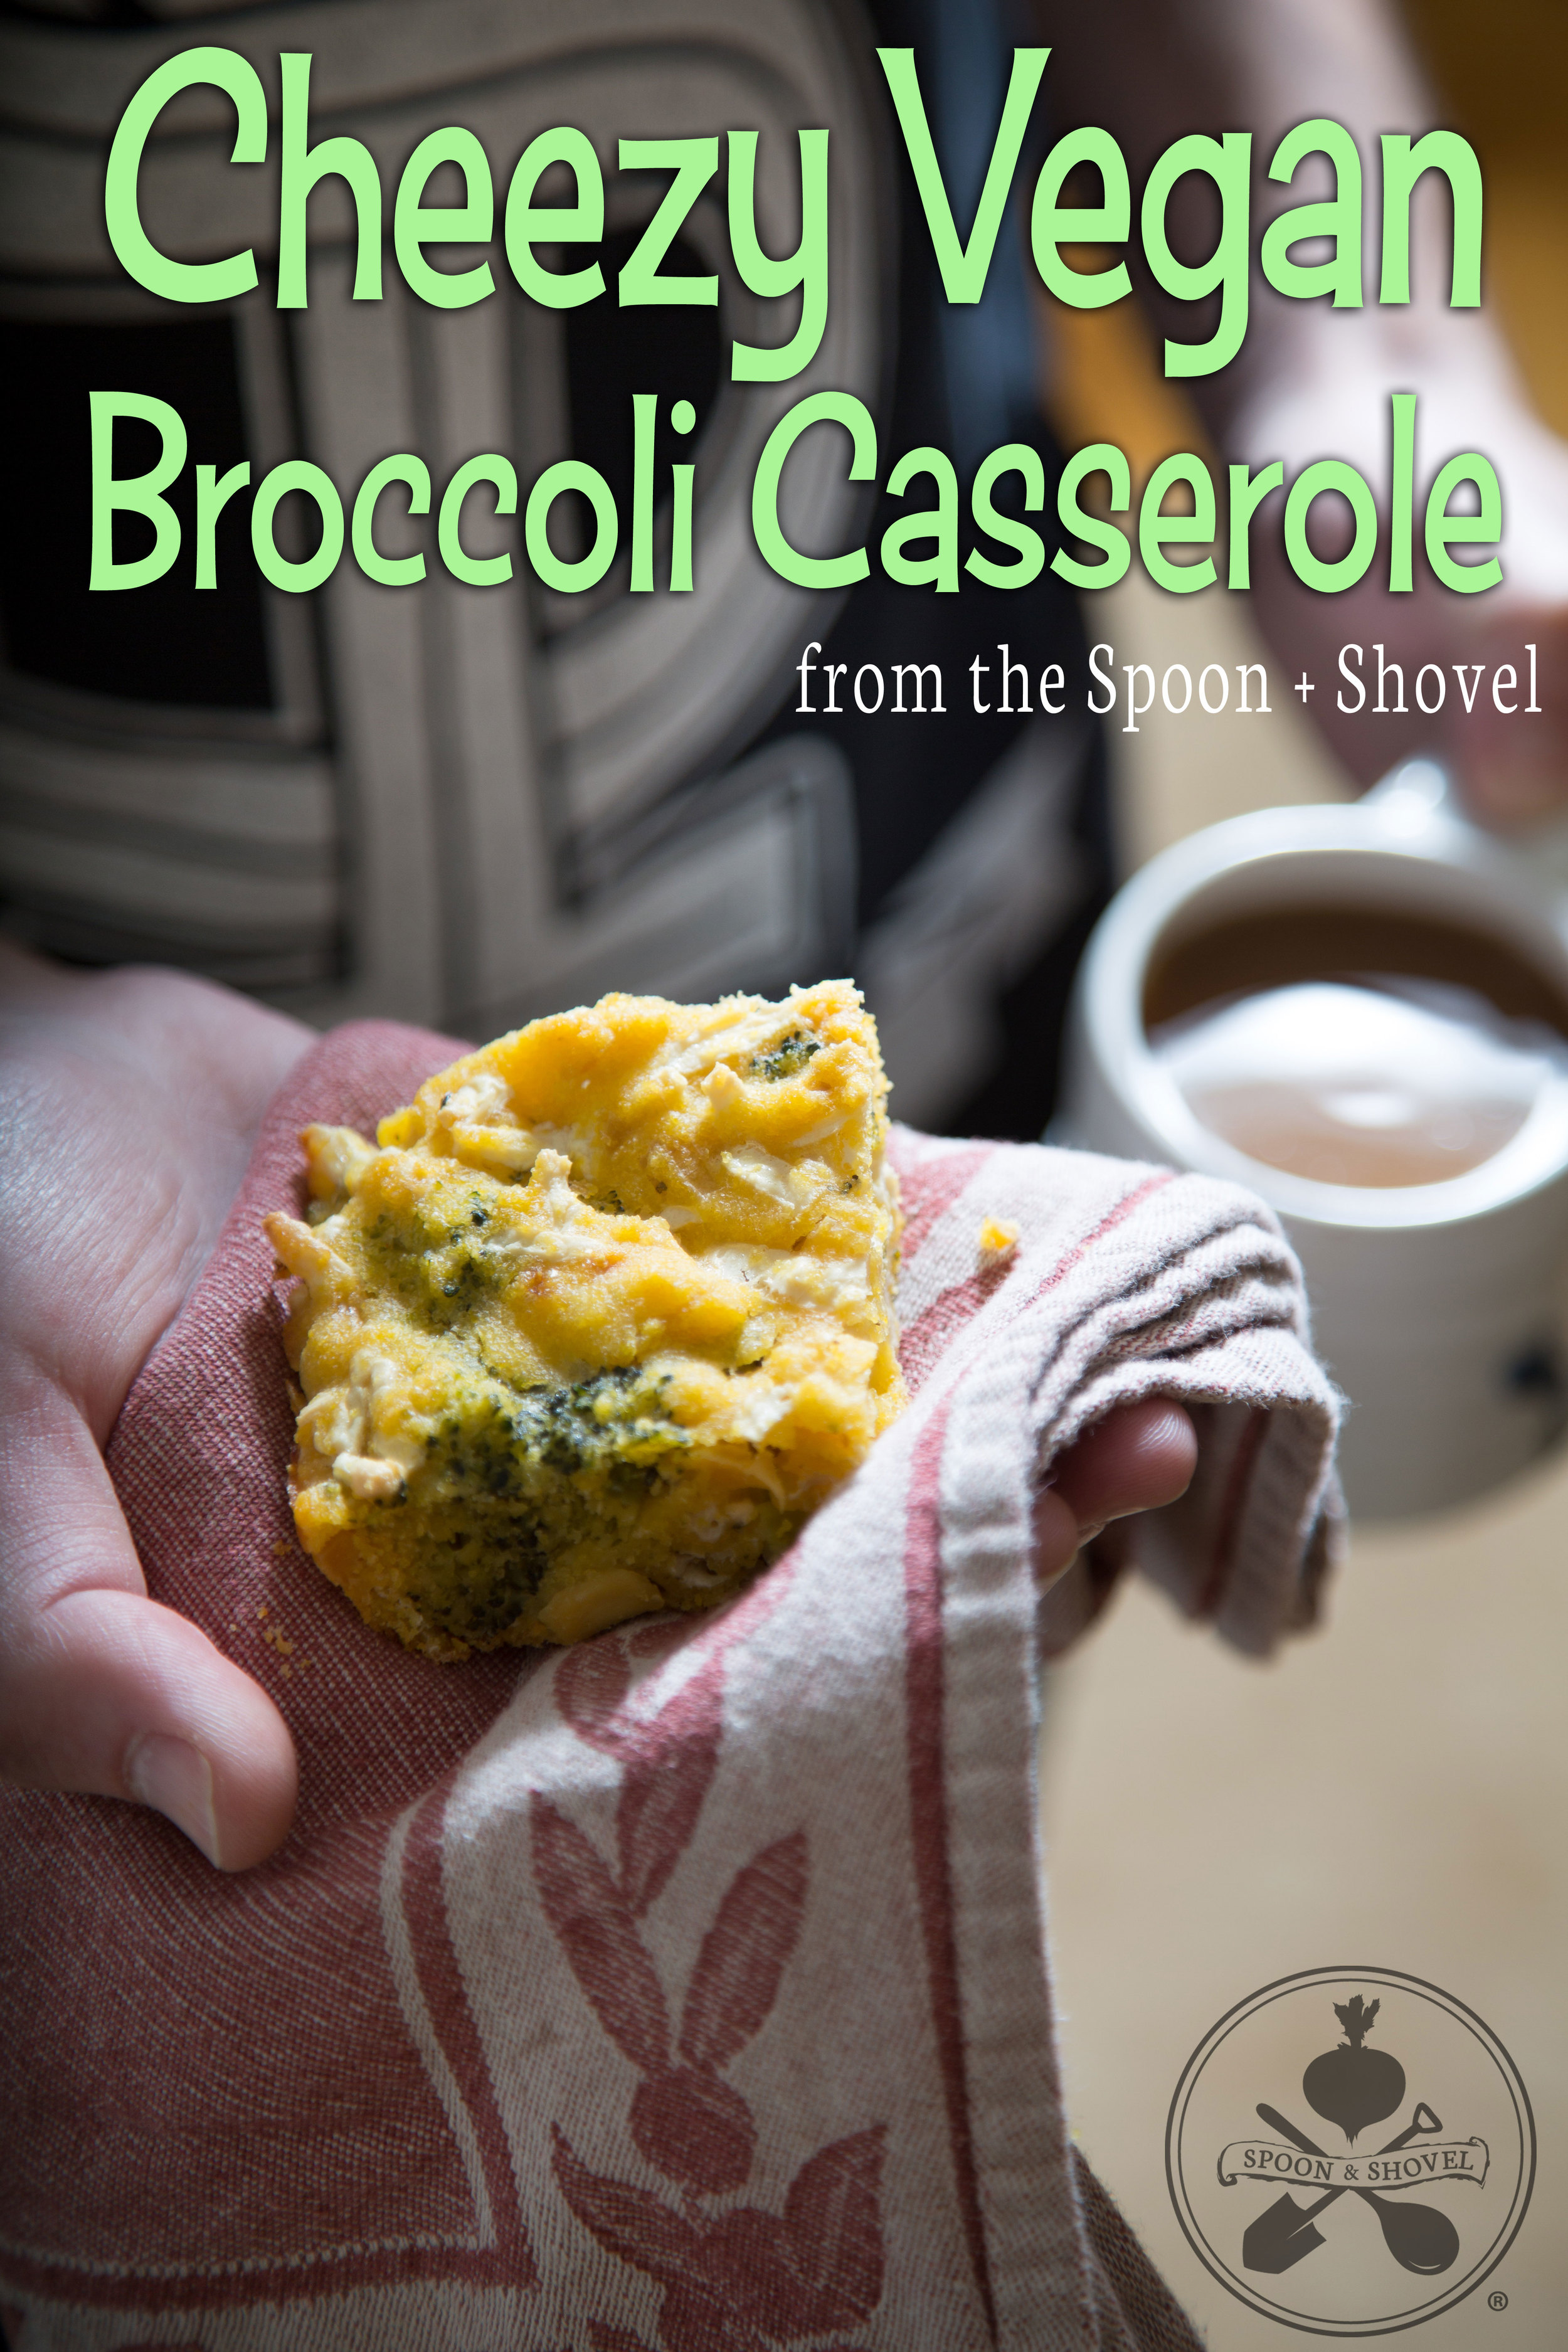 Cheezy vegan broccoli casserole from The Spoon + Shovel